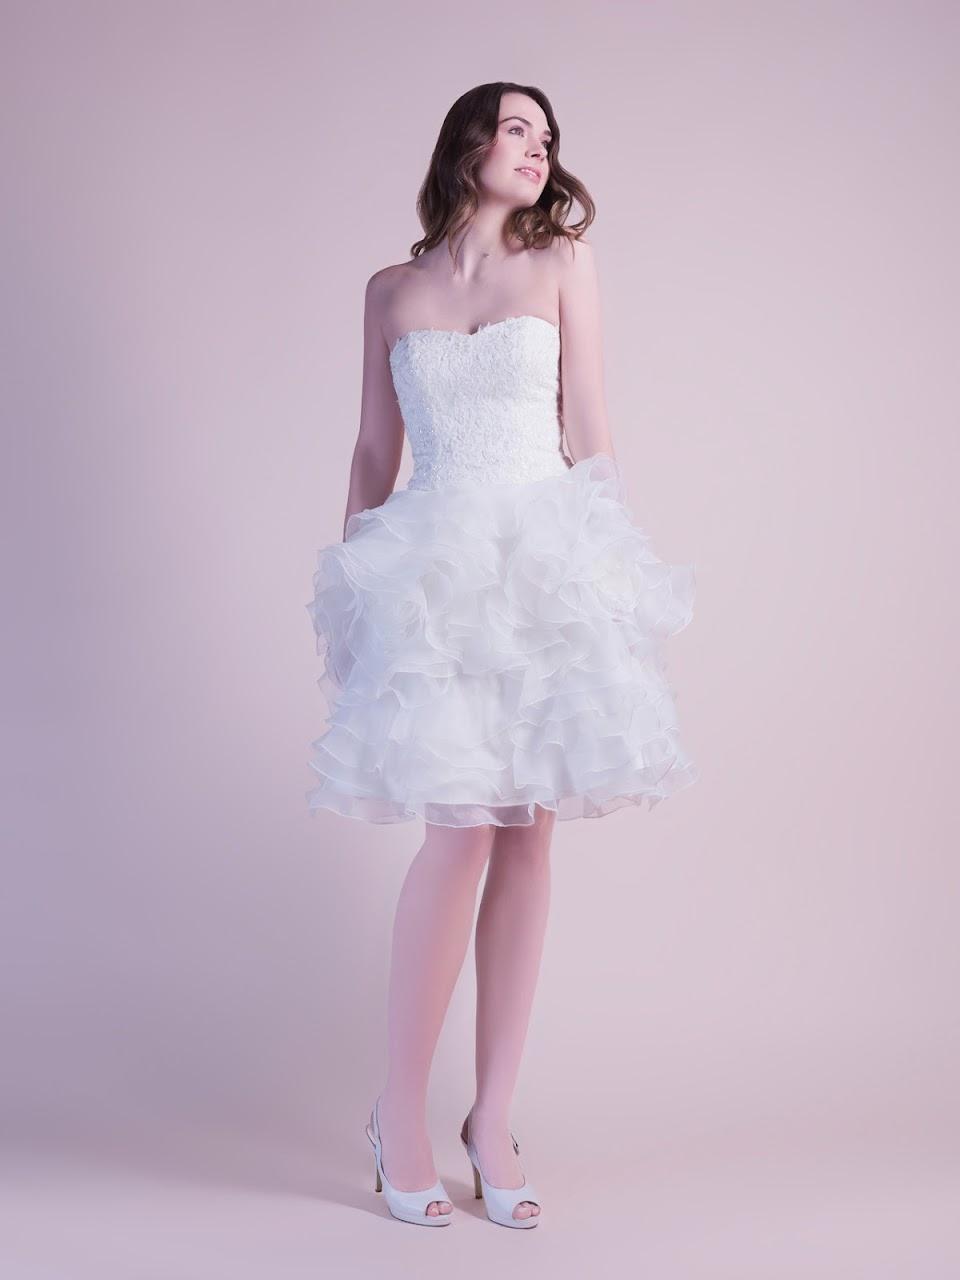 robe-de-mariee-delphine-version-courte-transformable-en-robe-de-mariee-longue